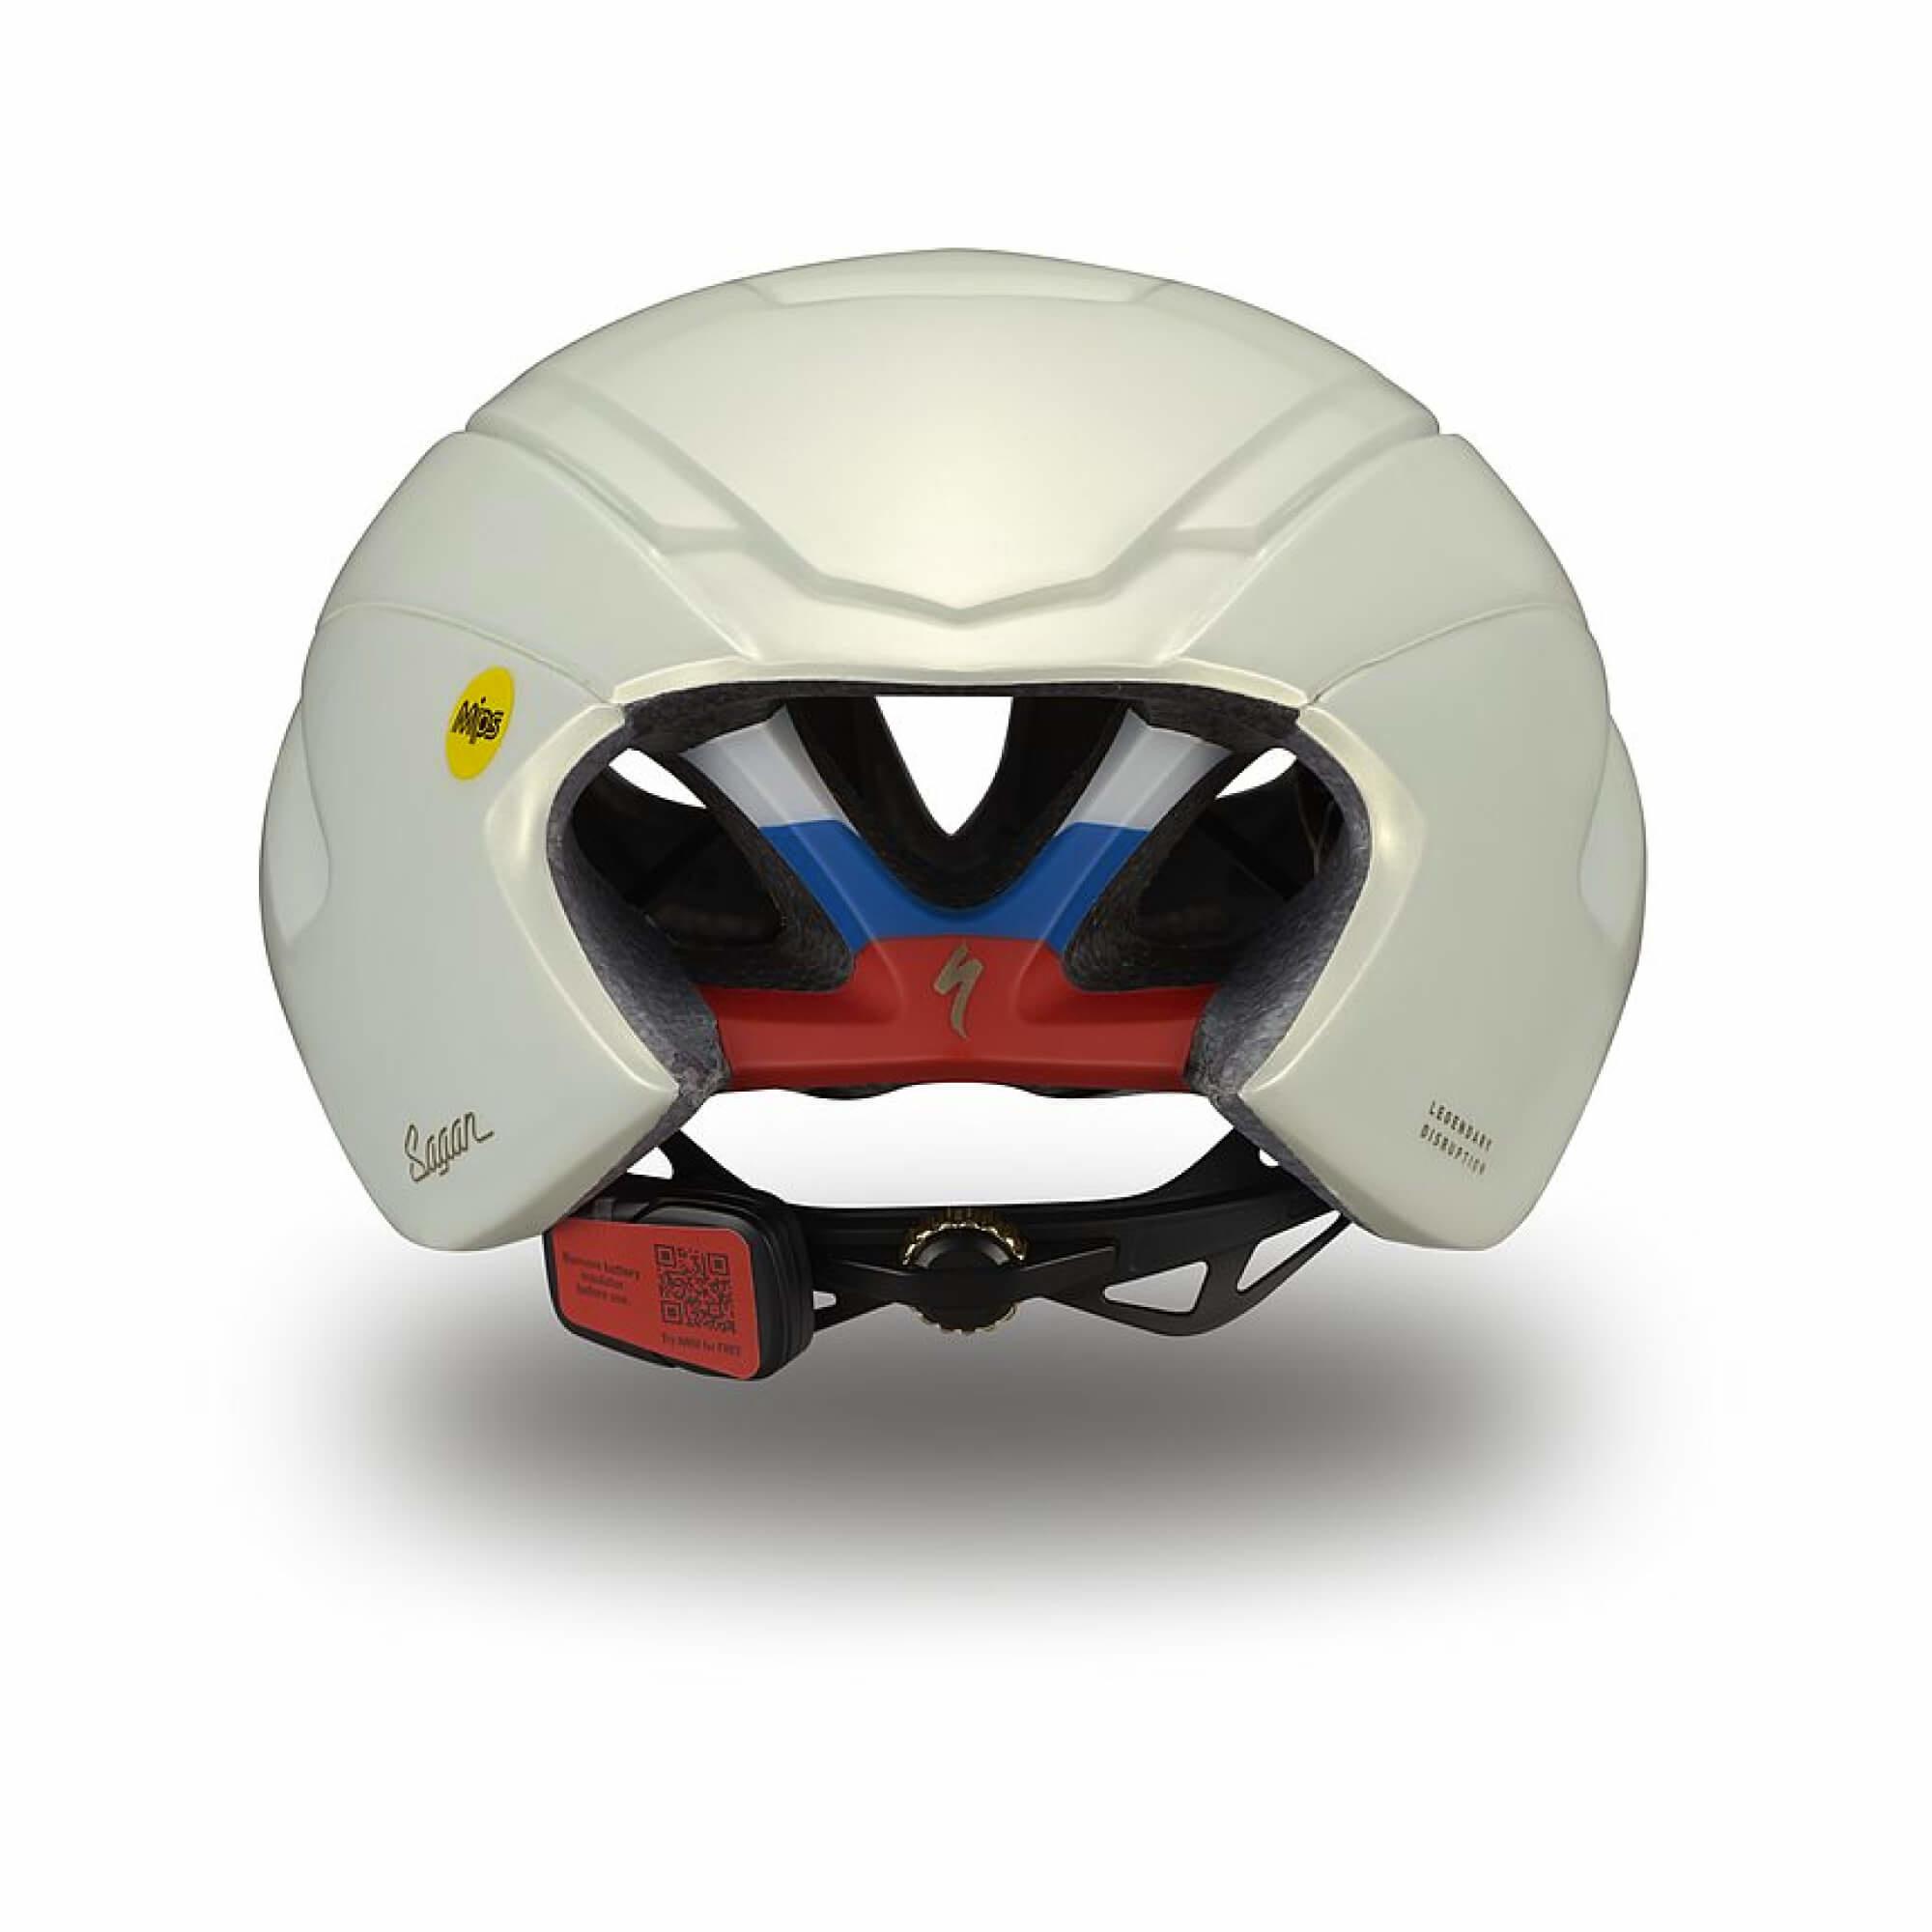 S-Works Evade II Helmet Angi Mips Sagan Disruption 2022-4